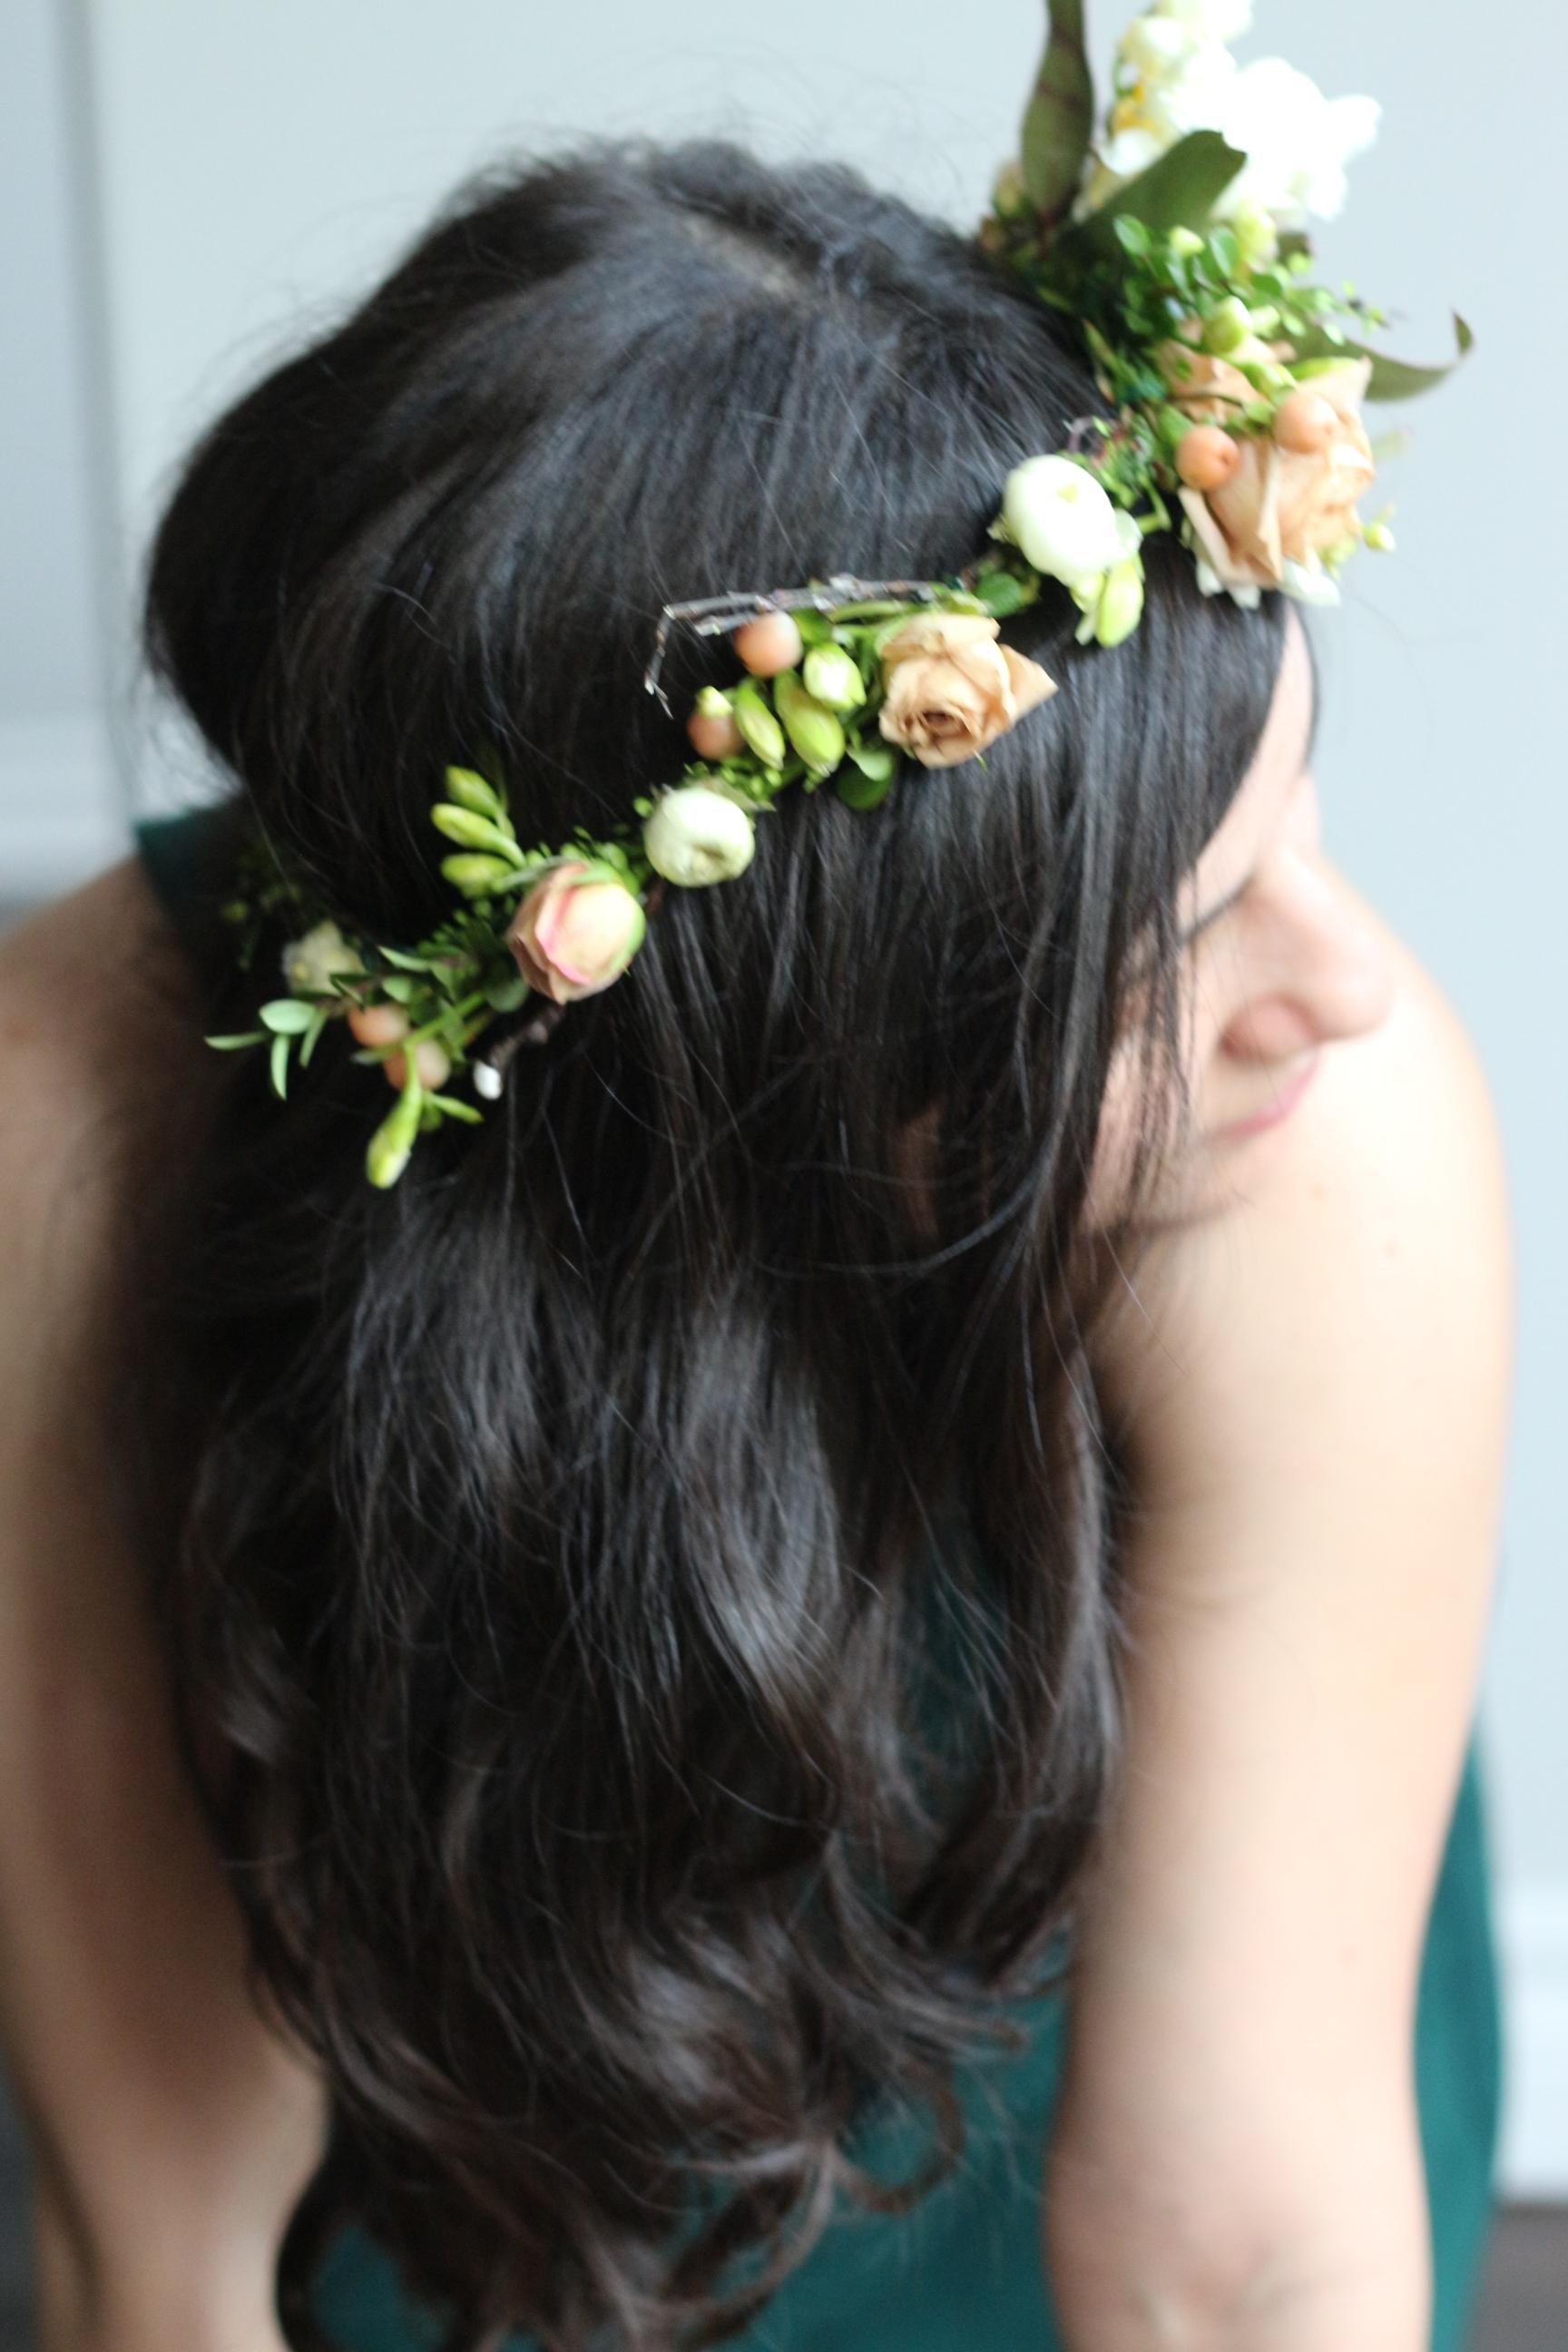 Flower Crowns Handmade Creations